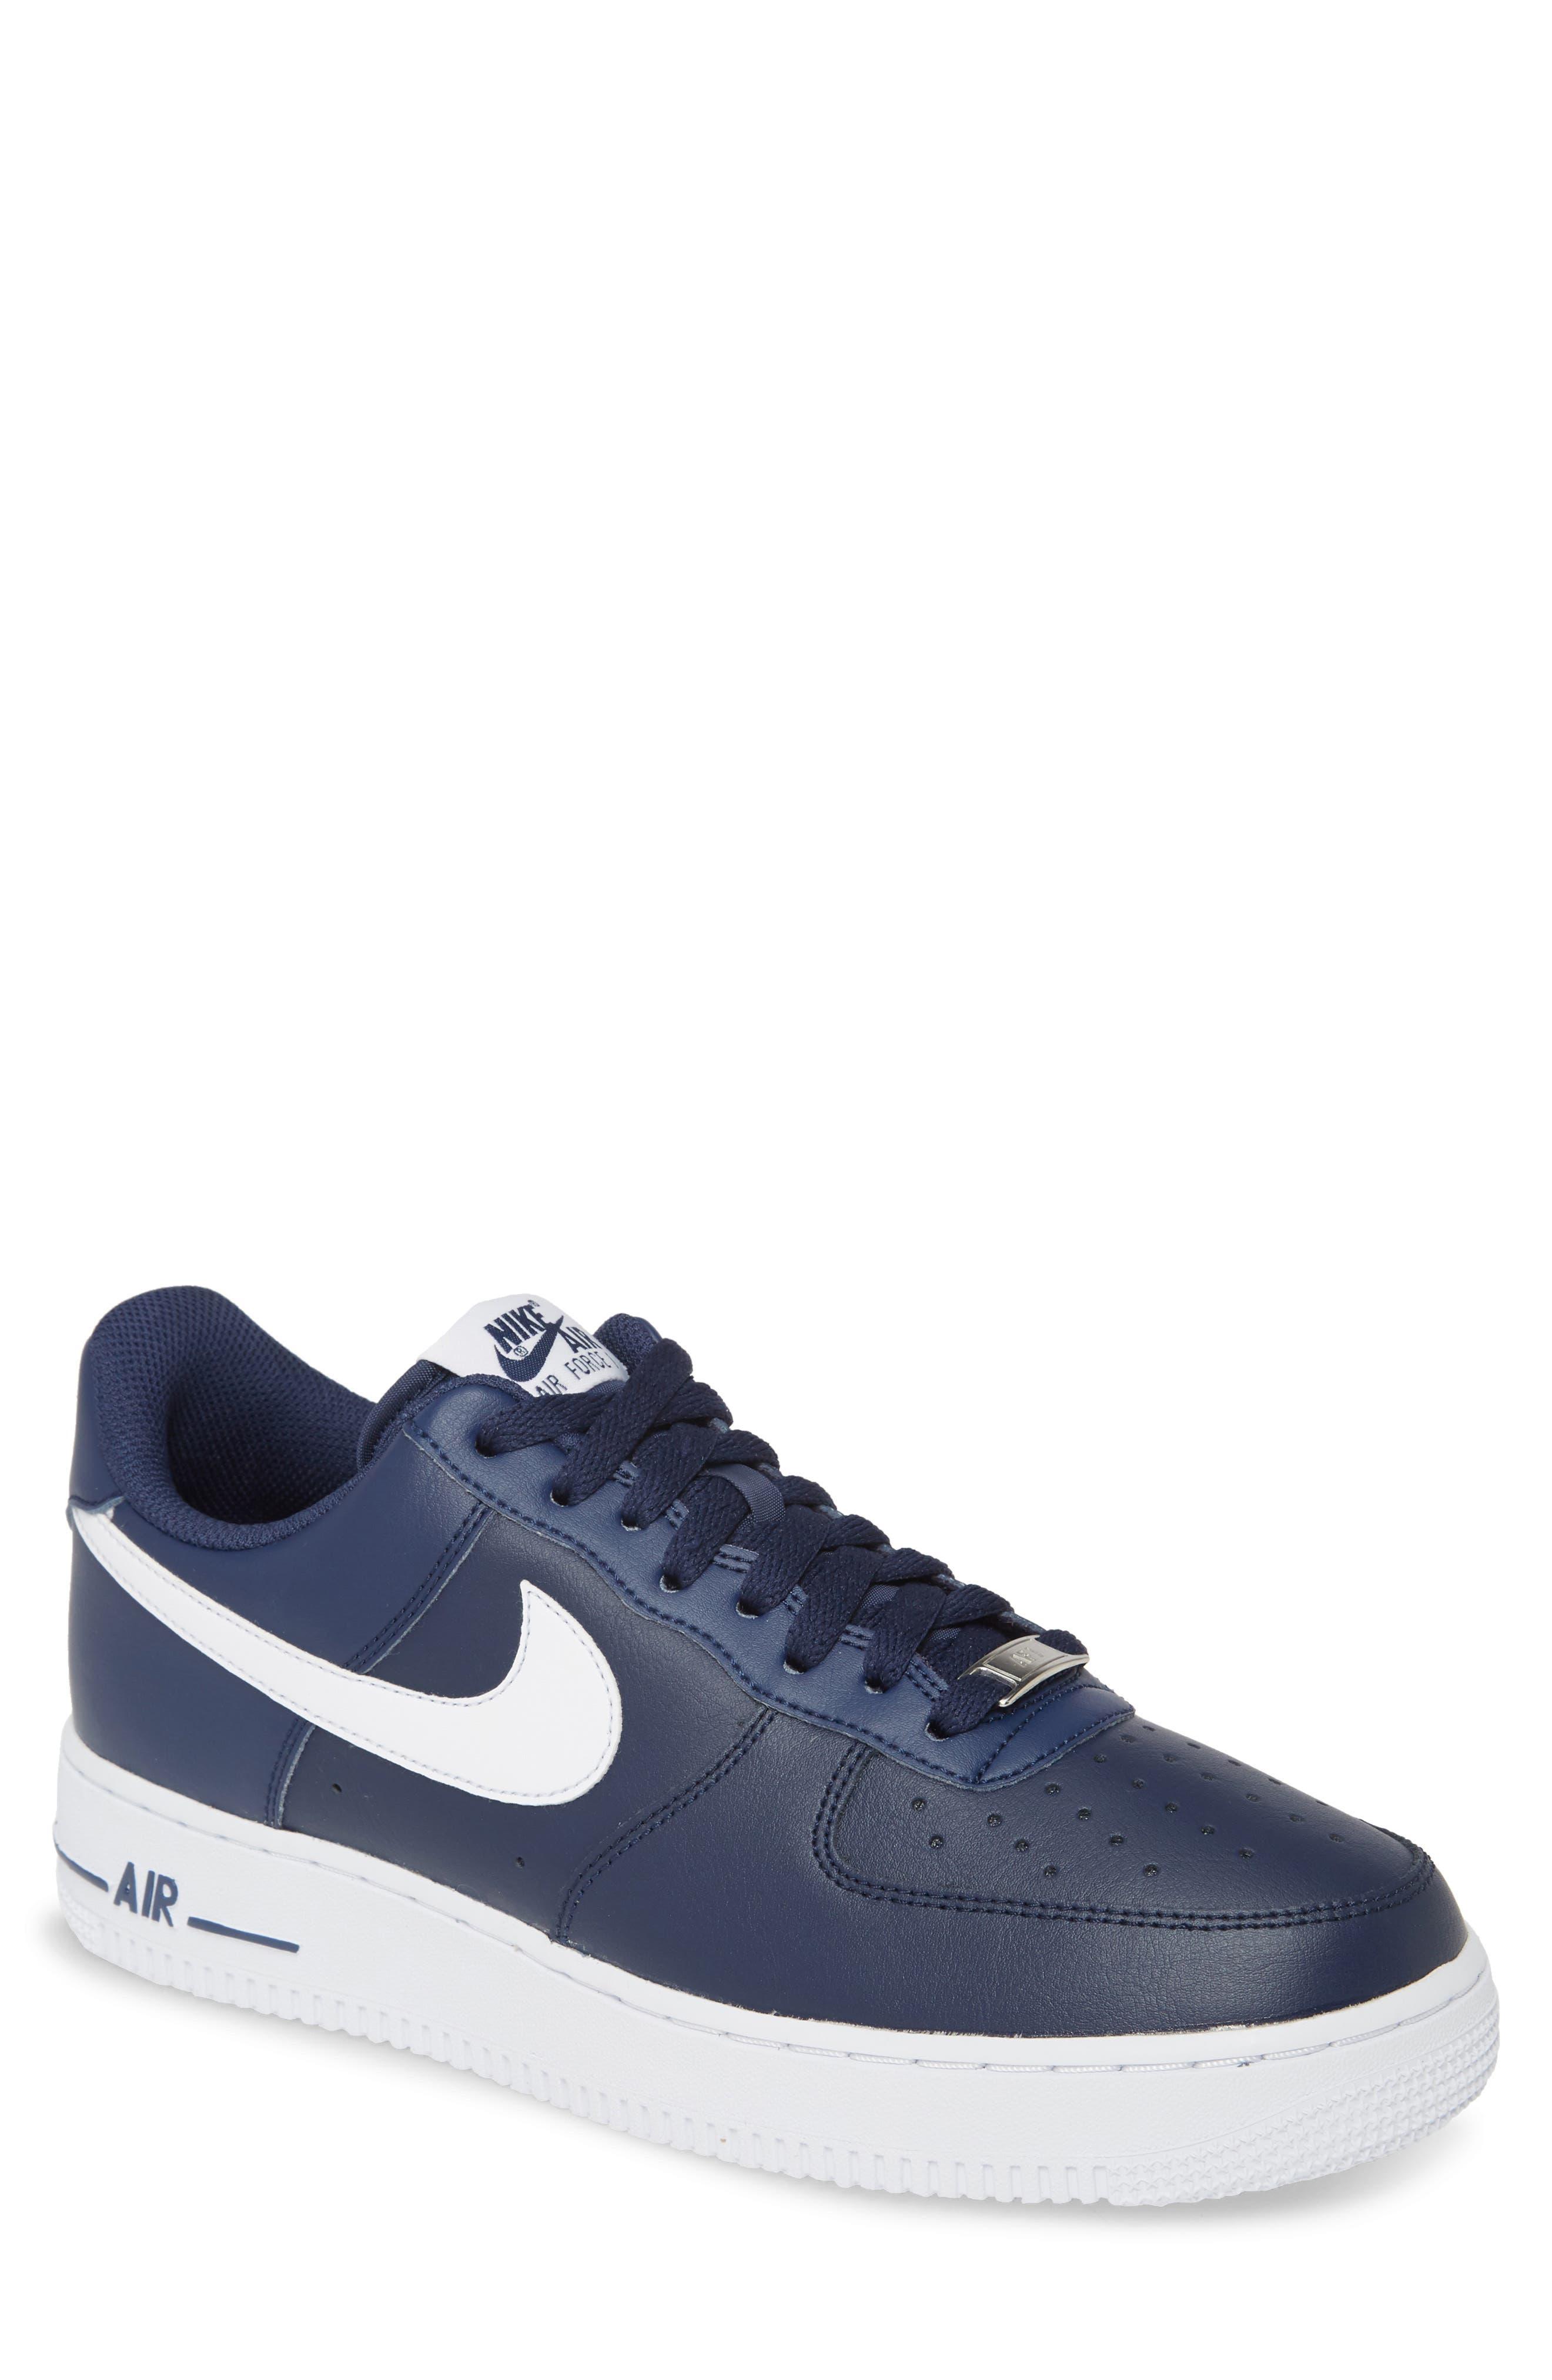 Blue Nike | Nordstrom